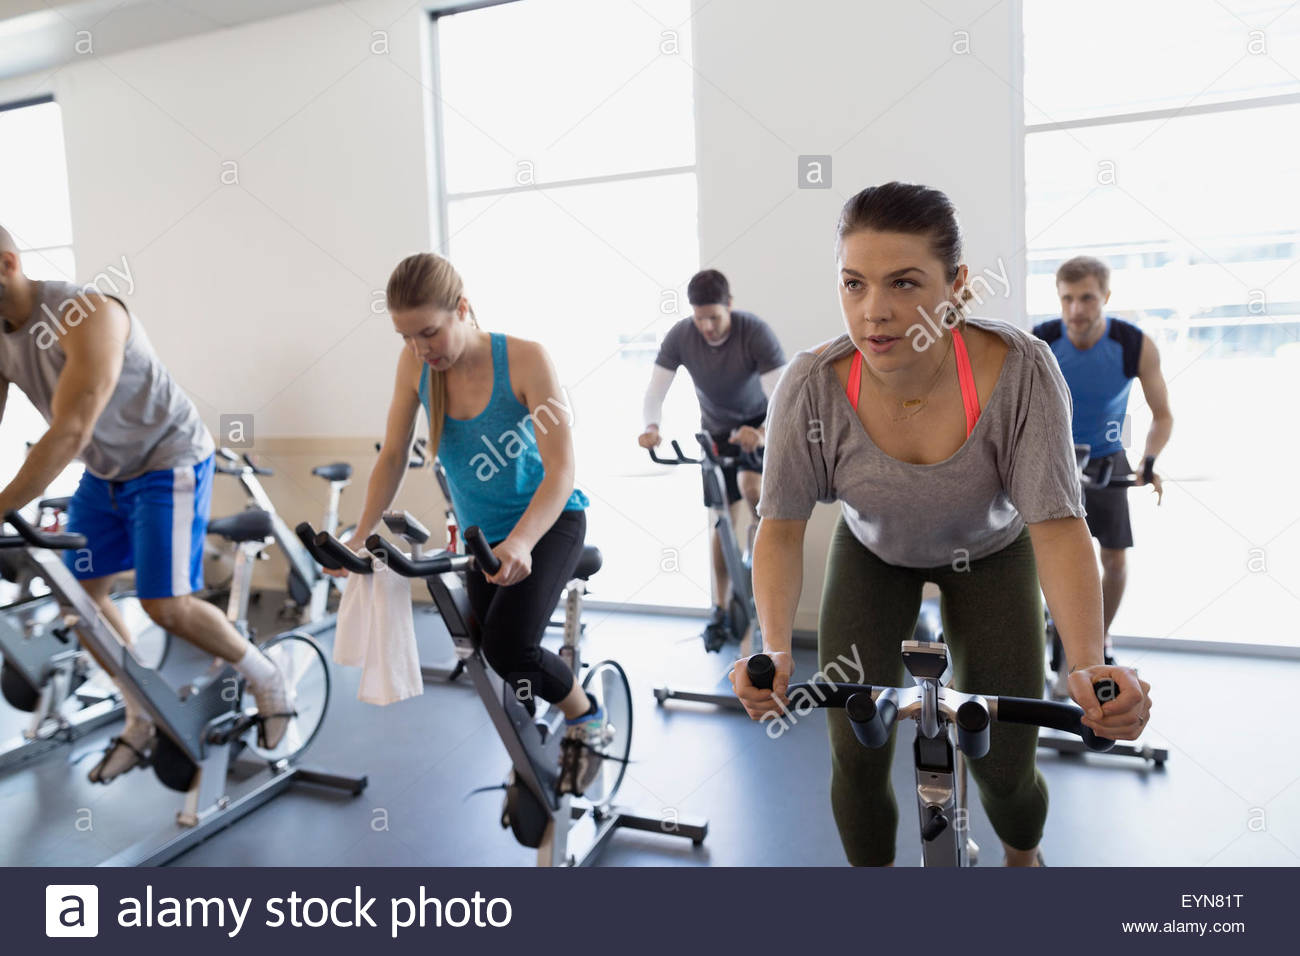 Classe de spin bicicletas fixas no ginásio Imagens de Stock